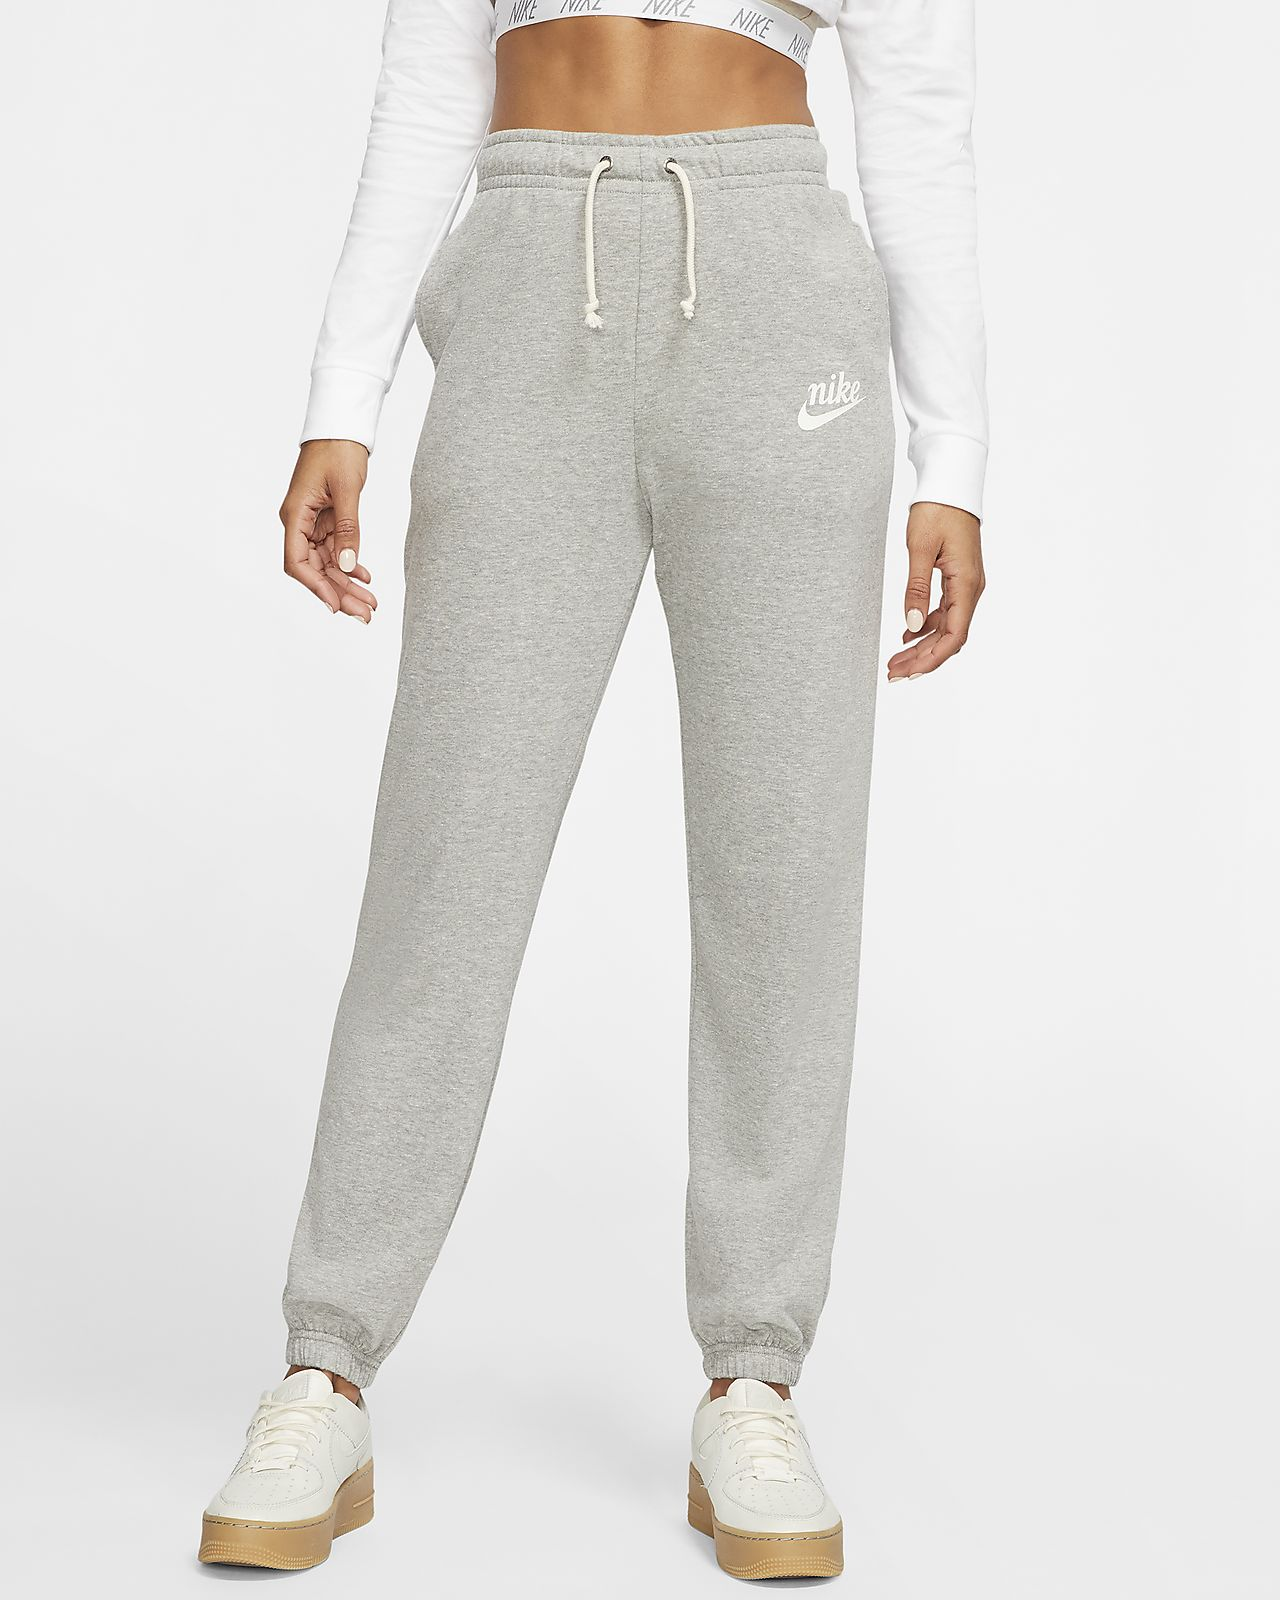 Nike Gym Vintage Trousers Grey